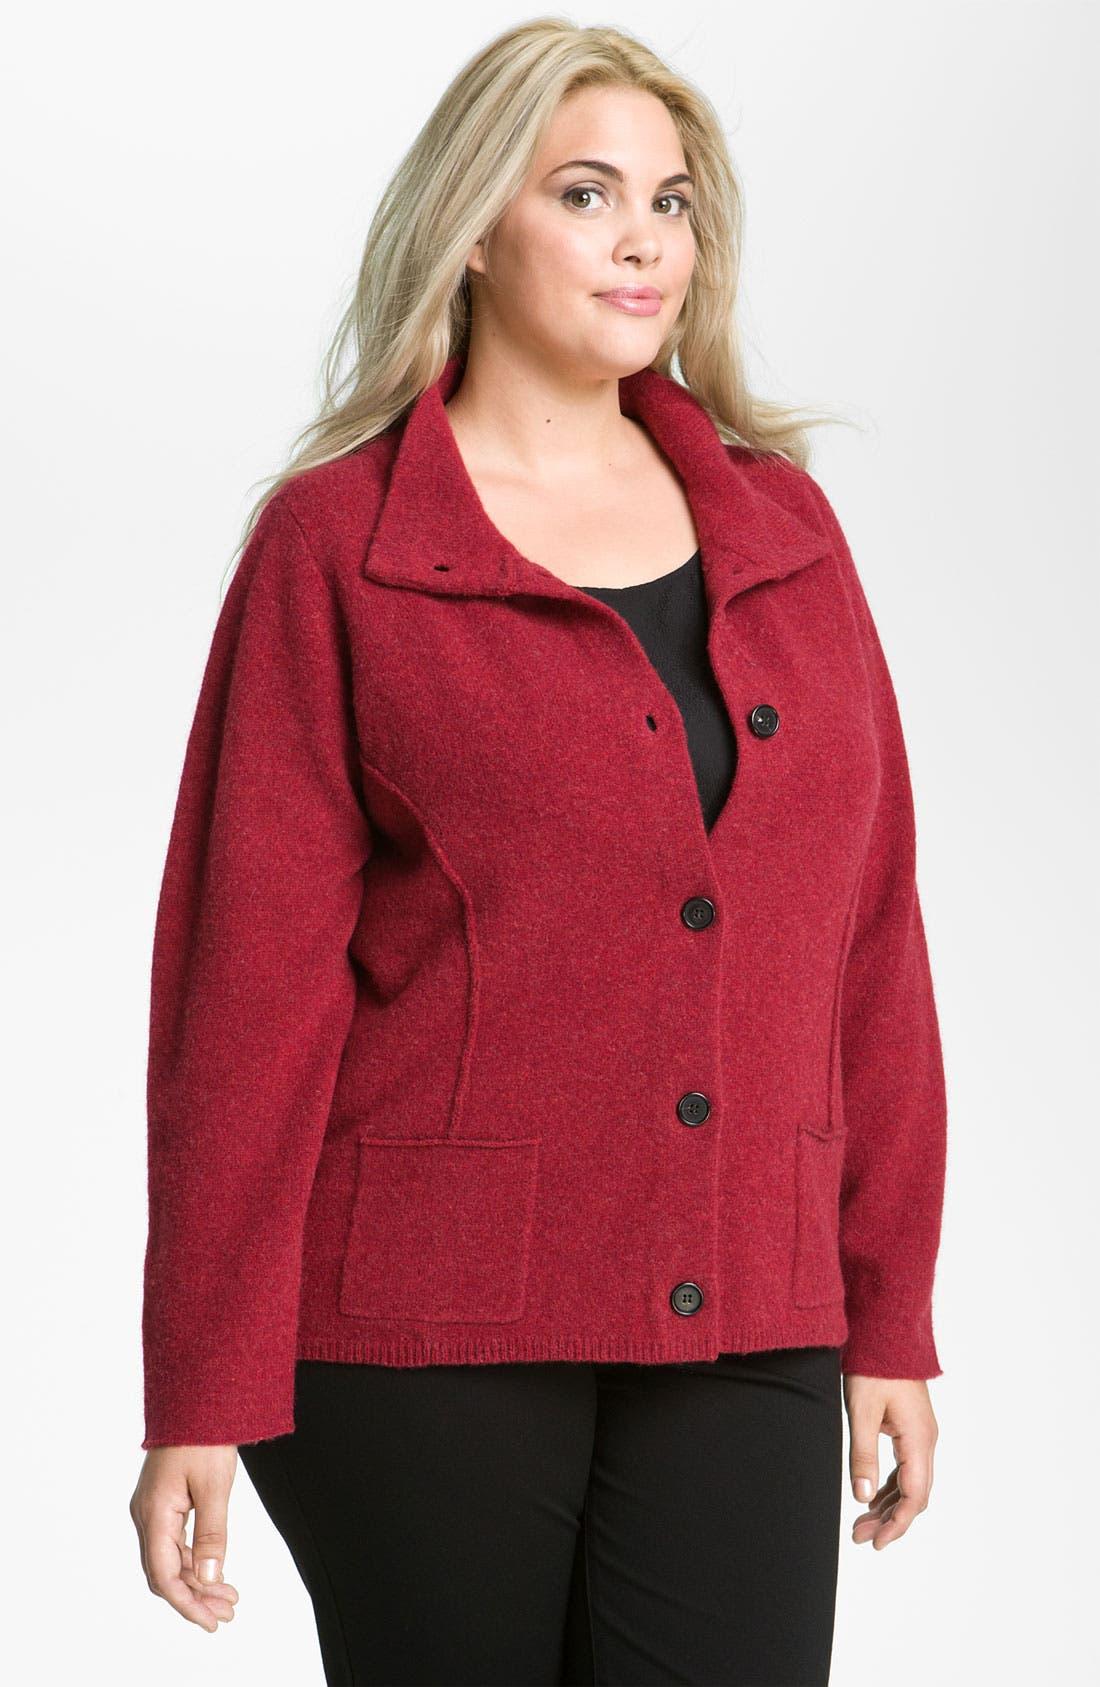 Alternate Image 1 Selected - Eileen Fisher Boiled Wool Jacket (Plus)